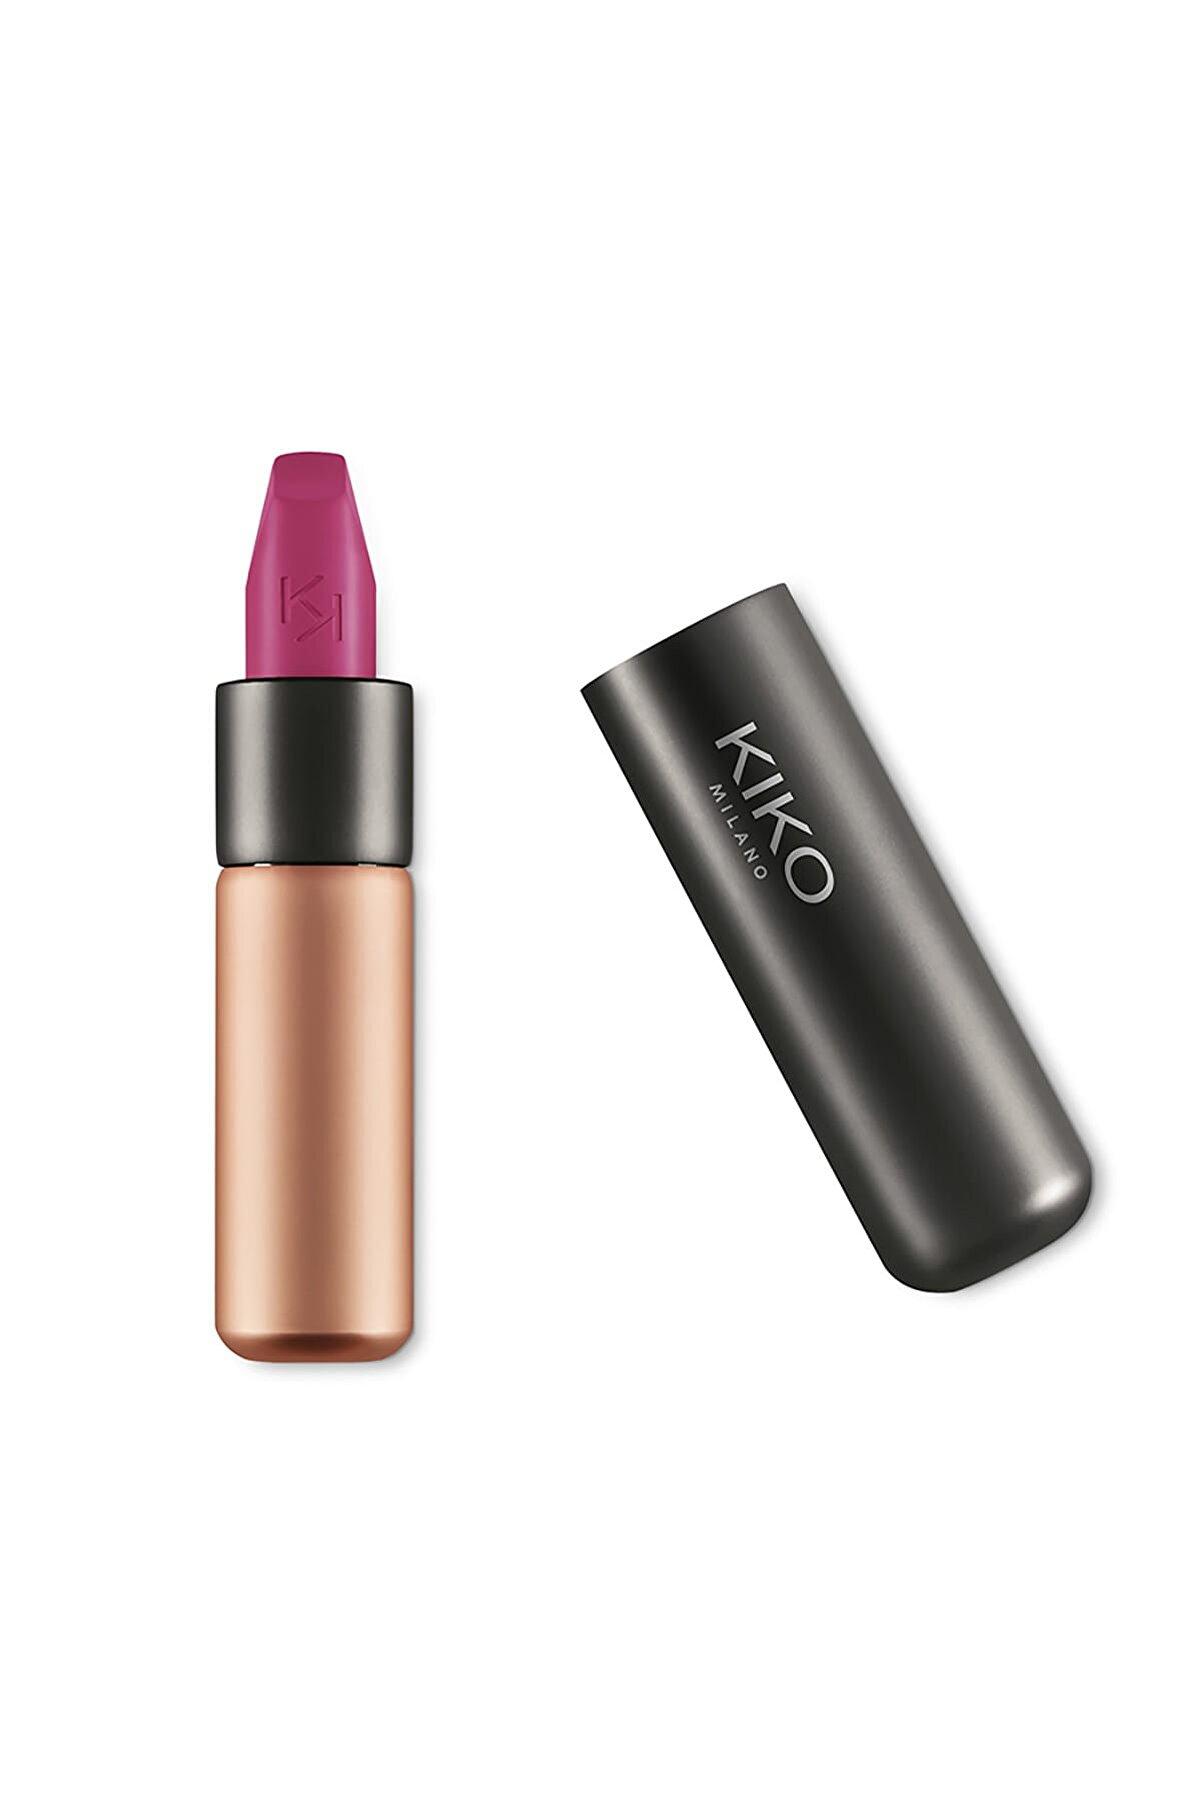 KIKO Saten Mat Ruj - Velvet Passion Matte Lipstick 314 Plum 8025272630269